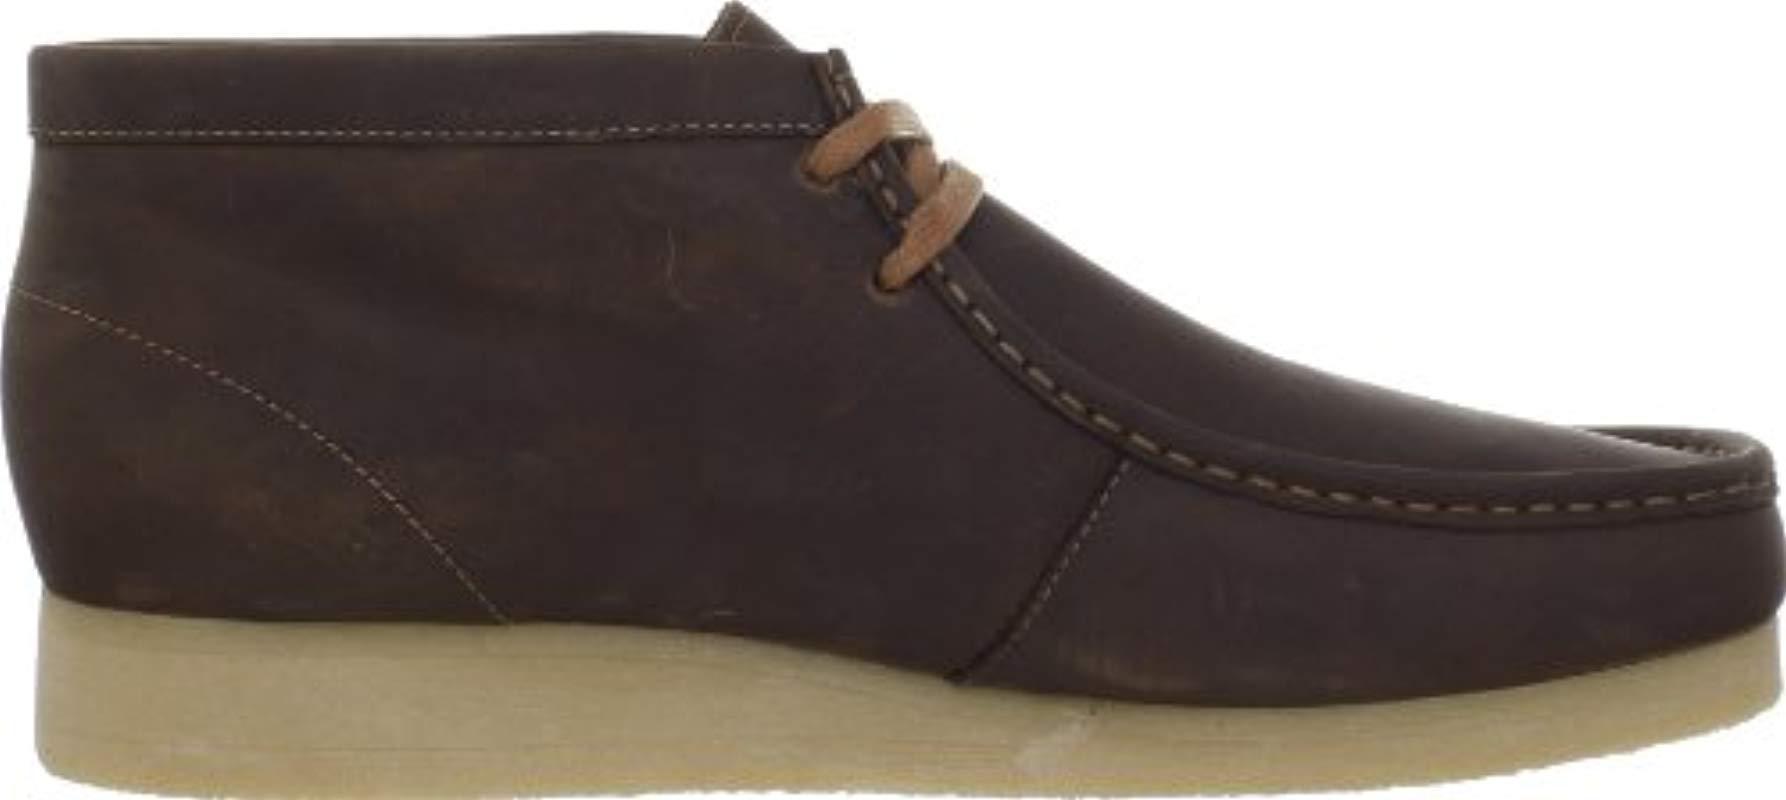 9910c8c46972aa Clarks - Brown Stinson Hi Chukka Boot